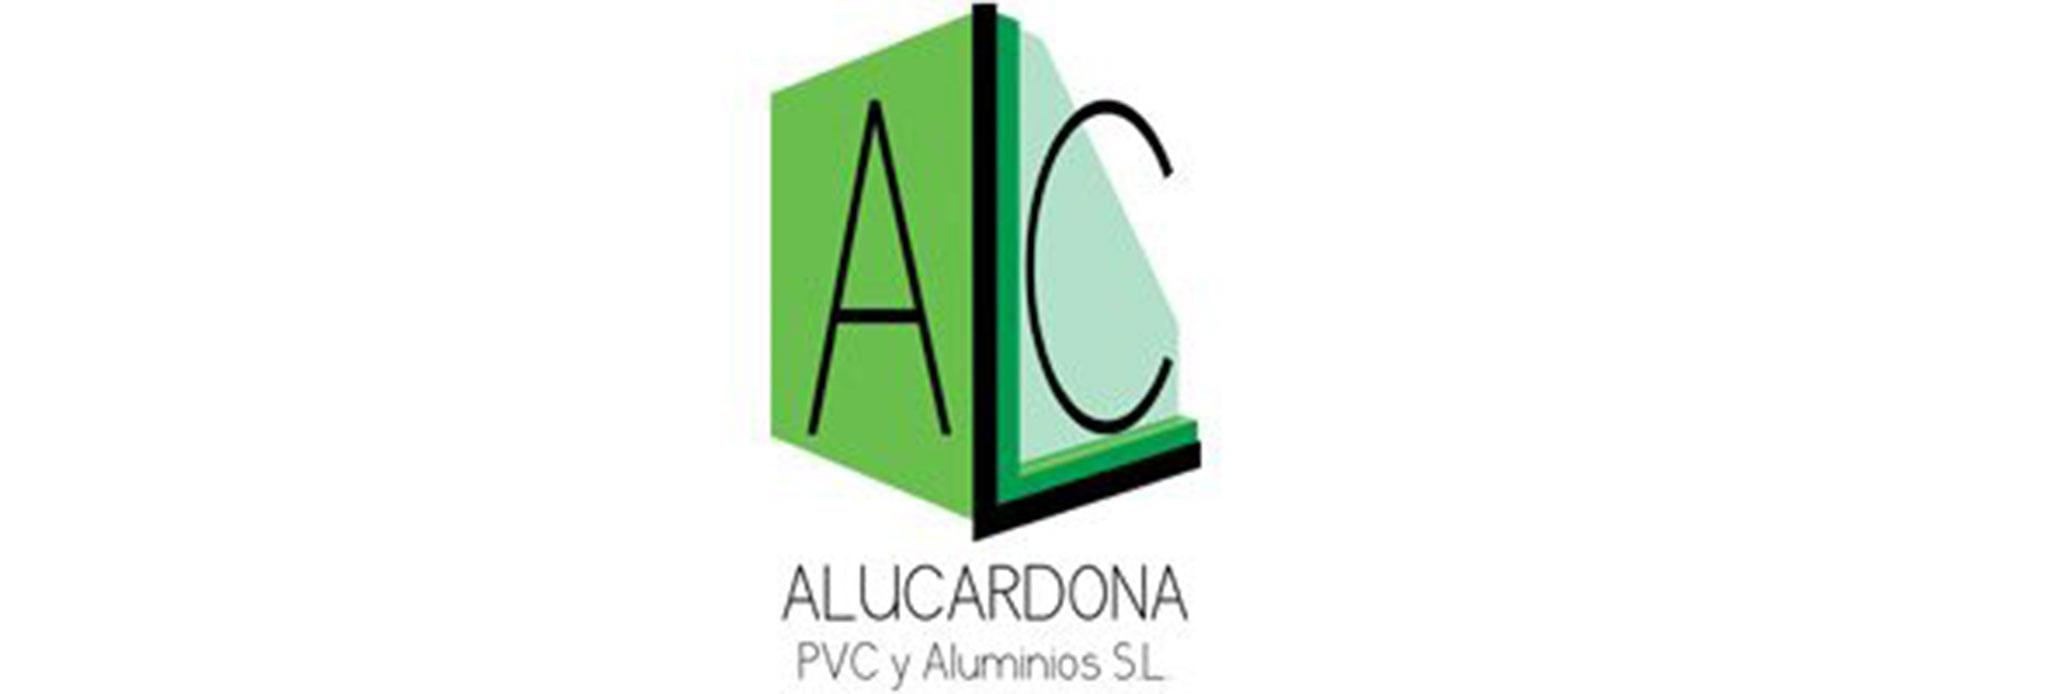 Logotipo de Alucardona Pvc y Aluminios, S.L.